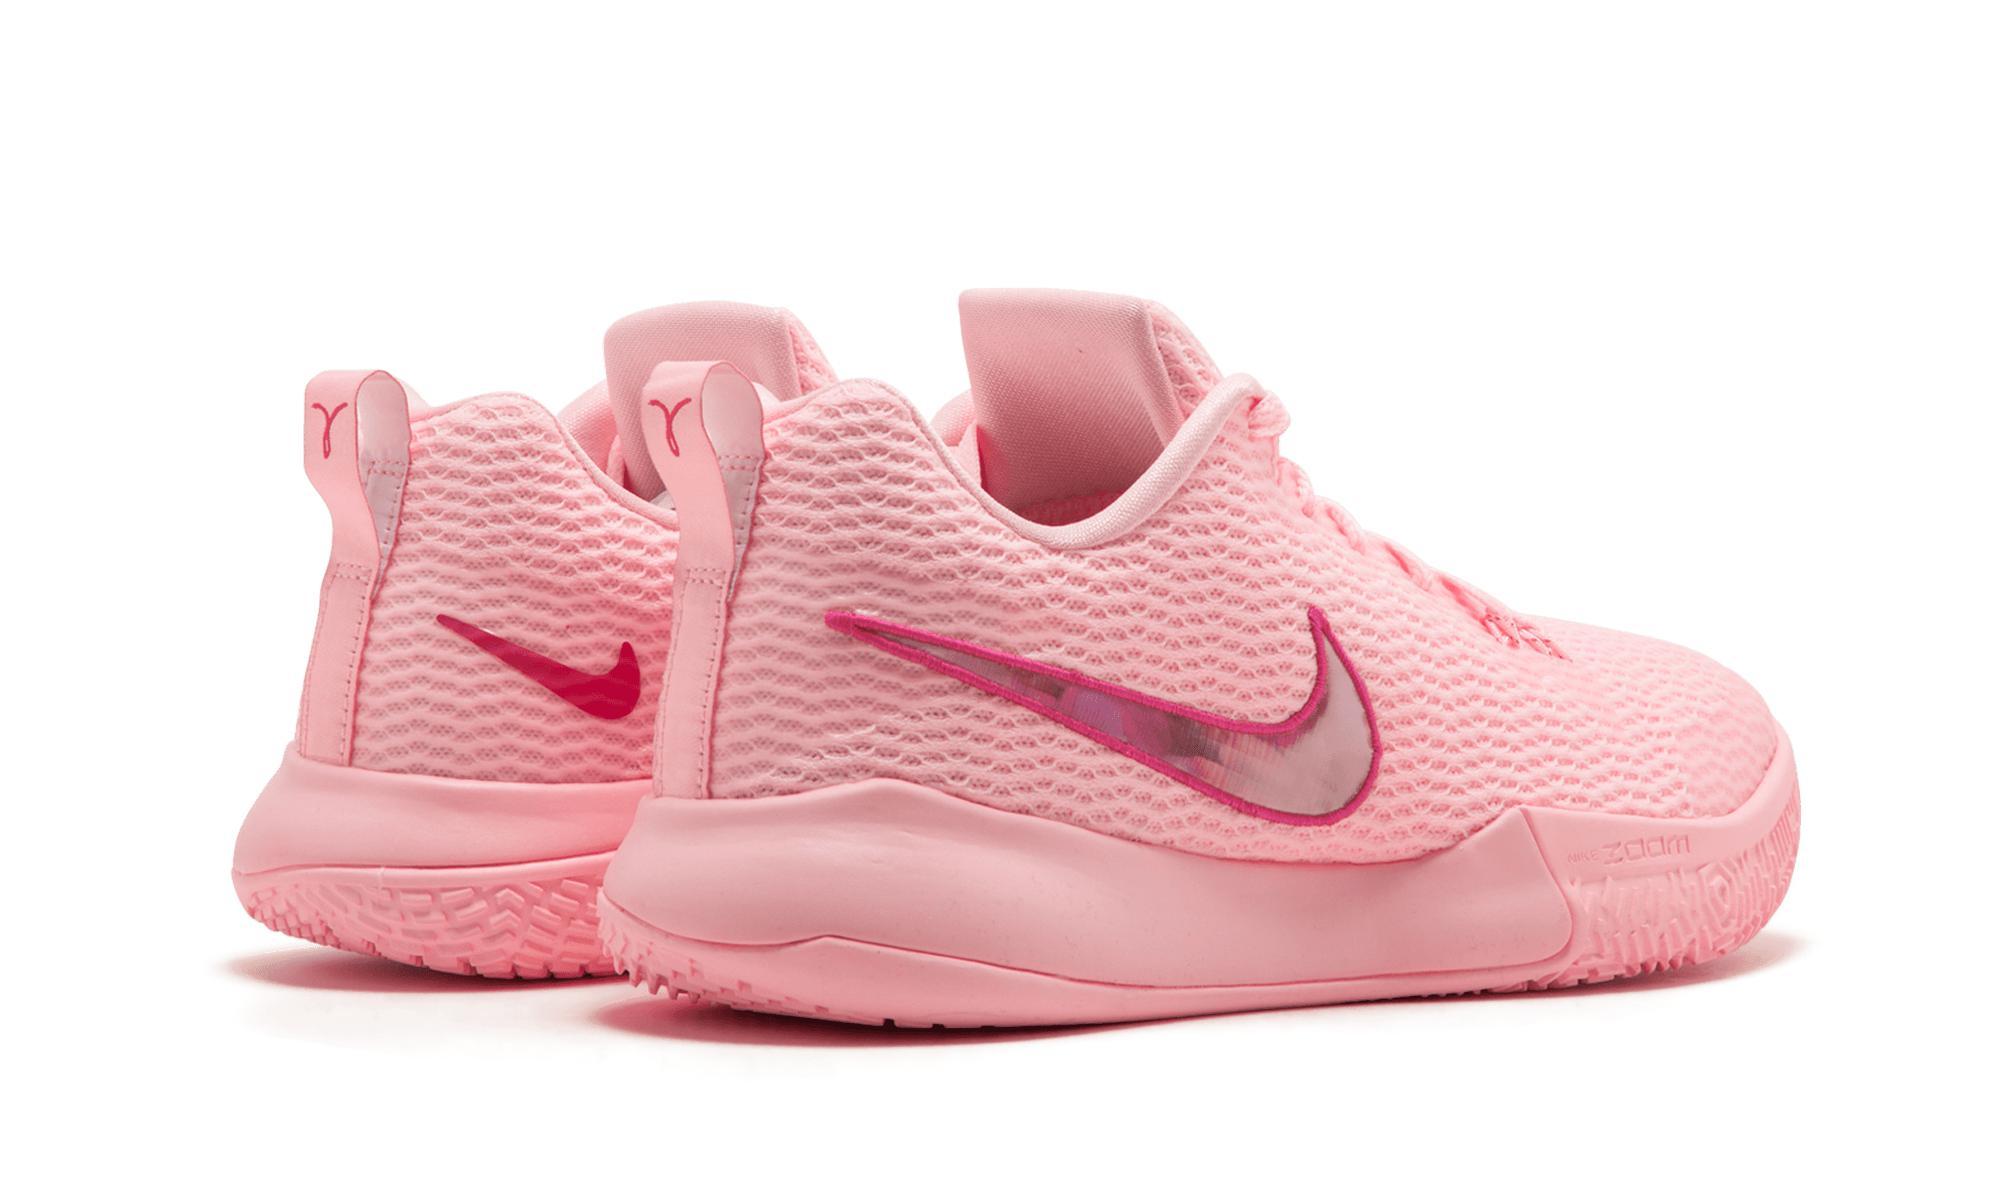 Nike ZOOM LIVE II KAY YOEP Arctic Punch Vivid Pink